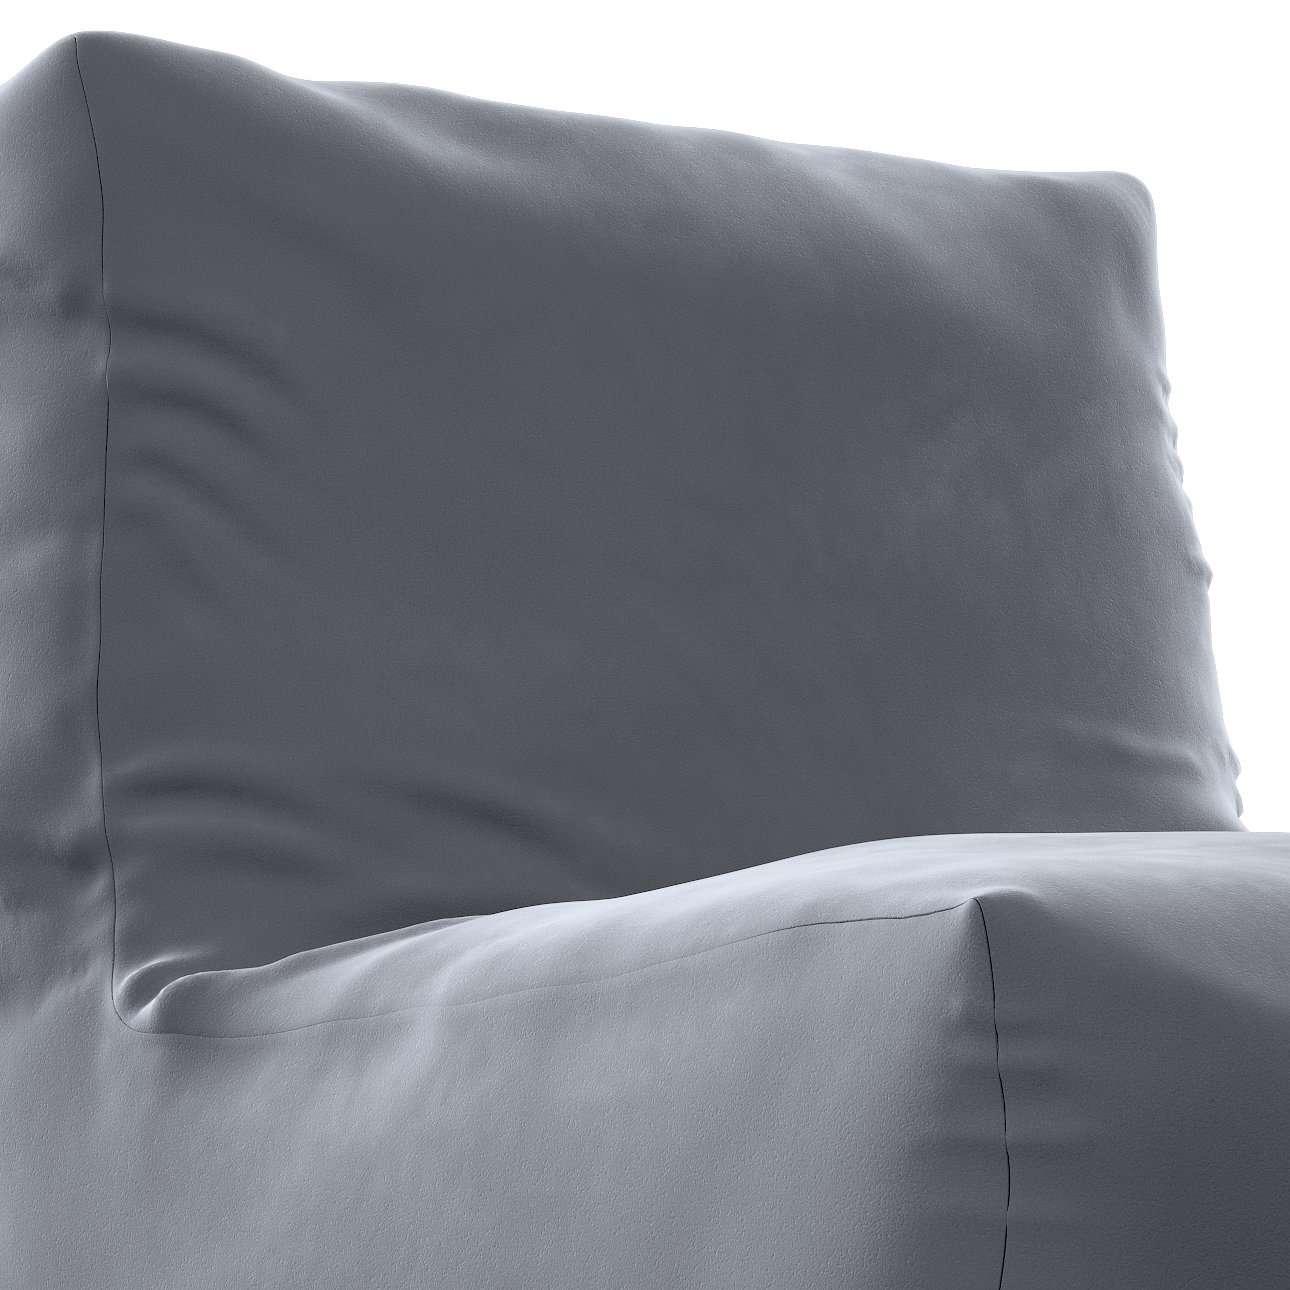 Pufa- fotel w kolekcji Velvet, tkanina: 704-12